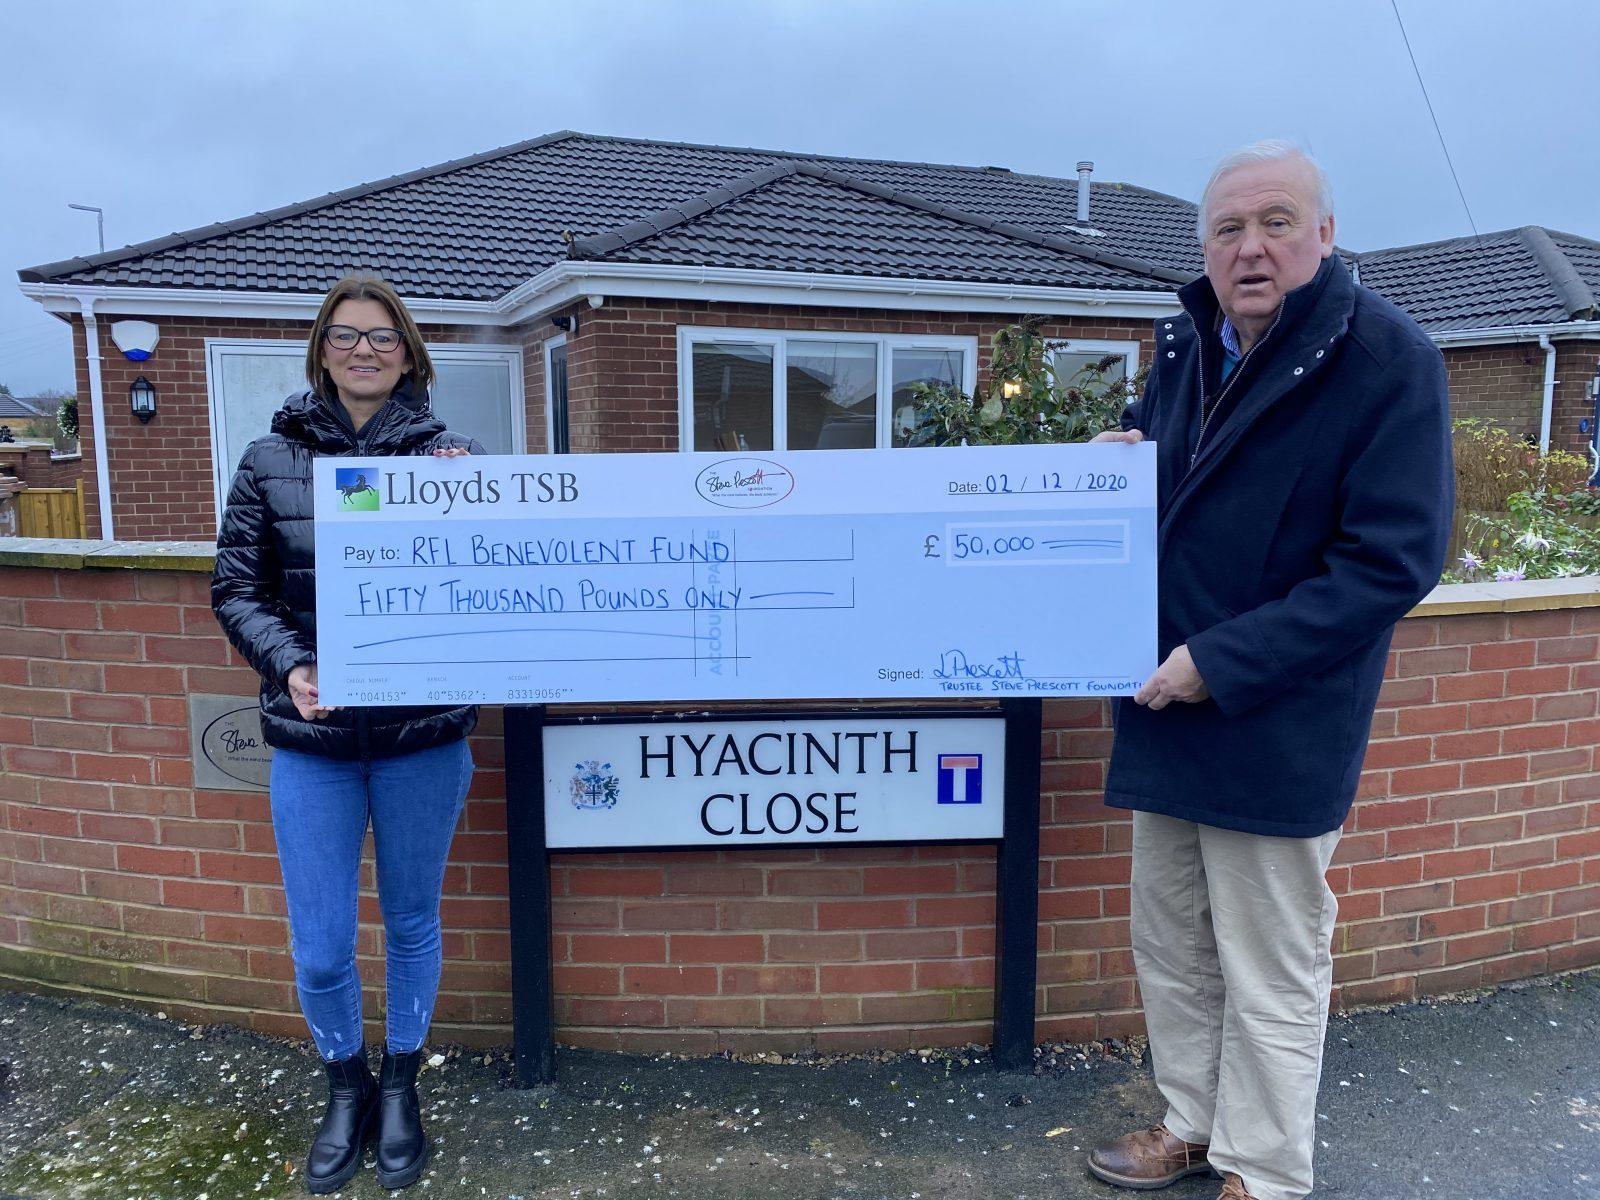 RL Benevolent Fund receives £50,000 from Steve Prescott Foundation